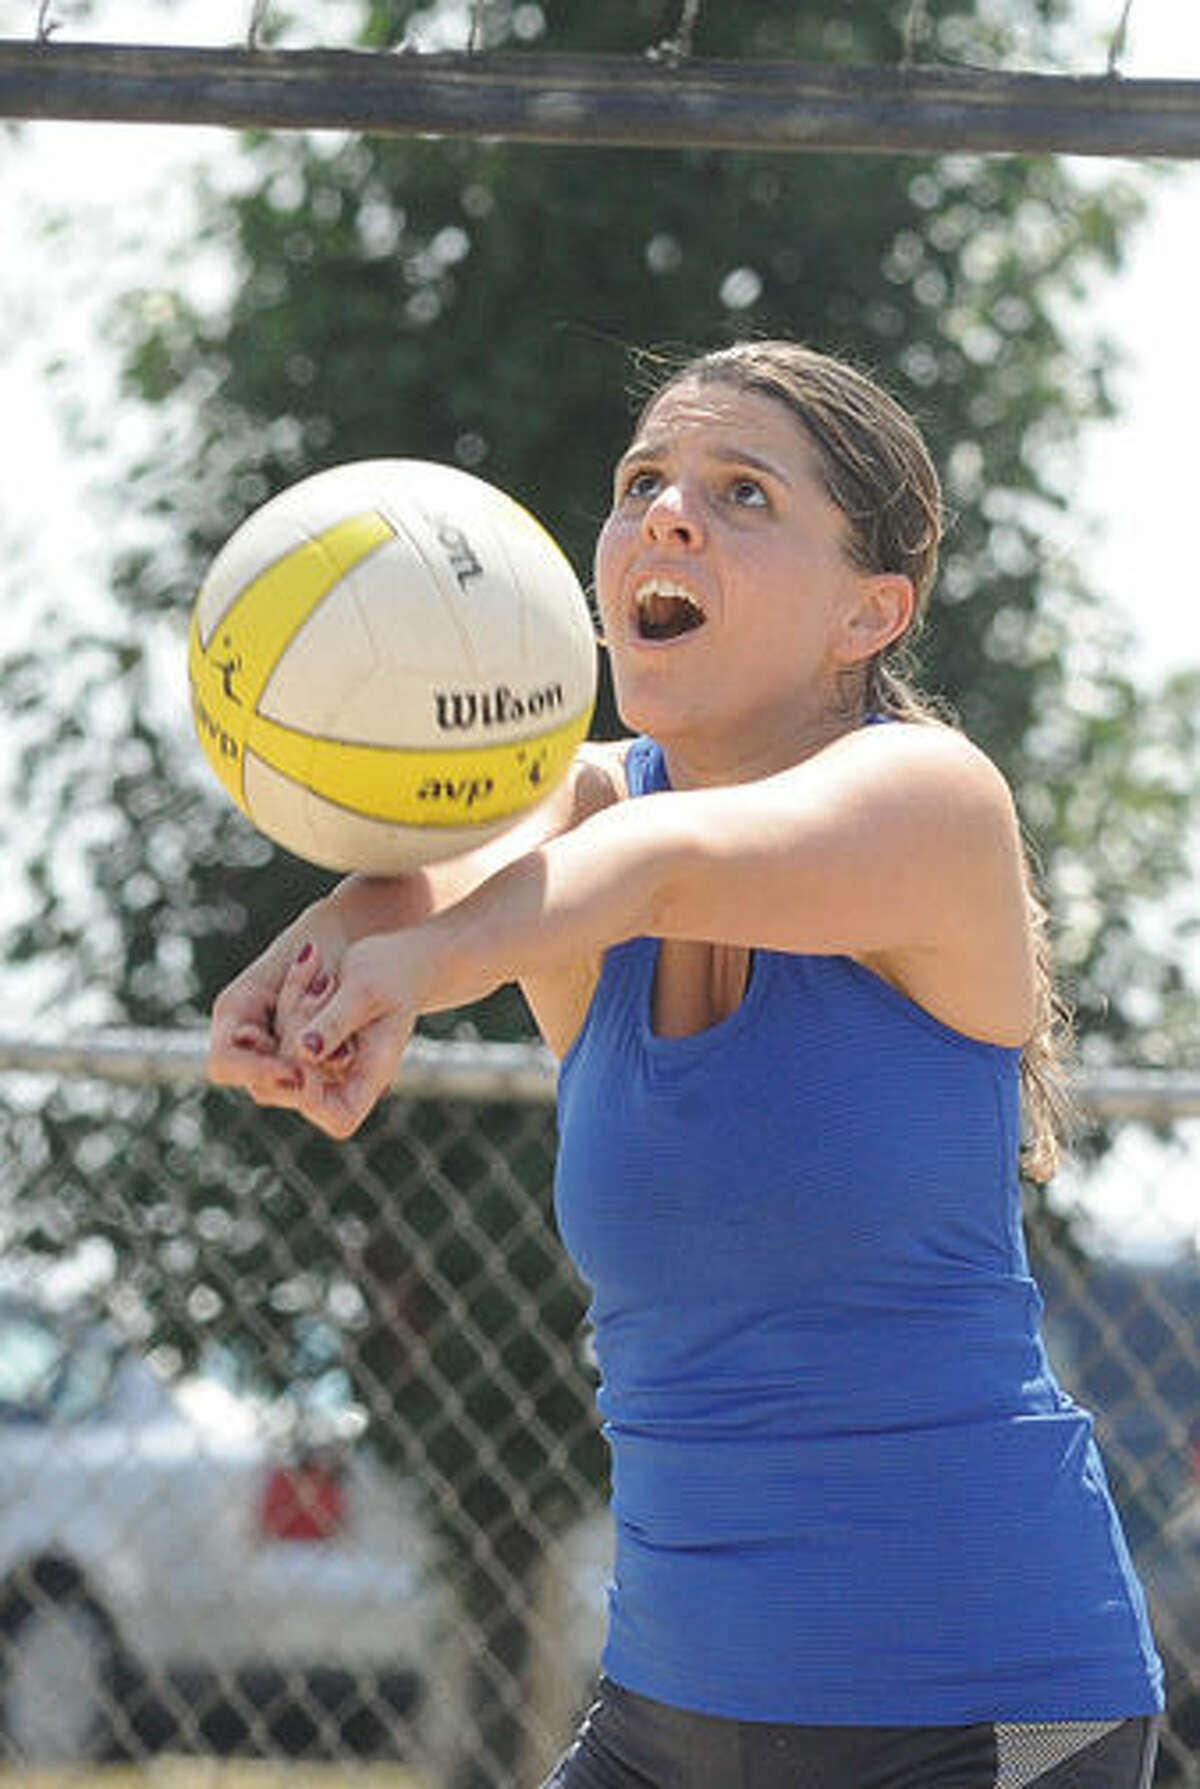 Mariana Beneton enjoys a game of volleyball Monday at Calf Pasture Beach. Hour photo/Matthew Vinci